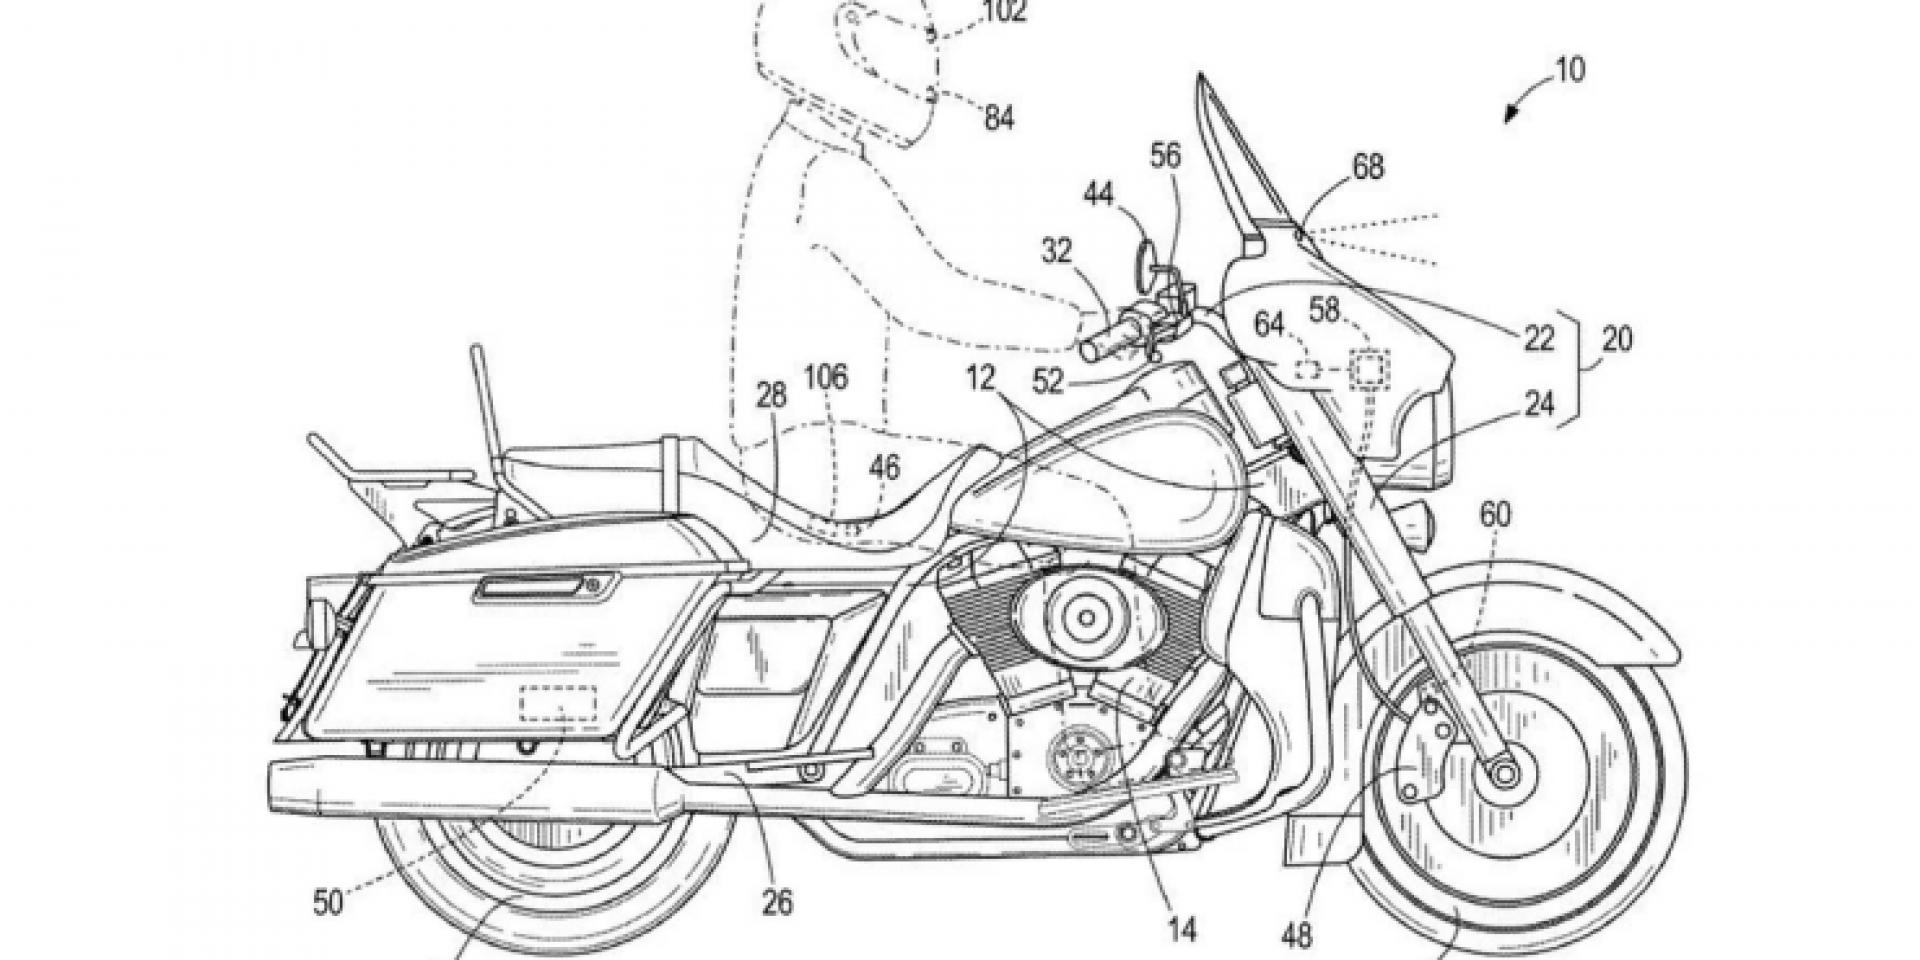 機車也有AEB!Harley-Davidson正在研發緊急煞車系統!